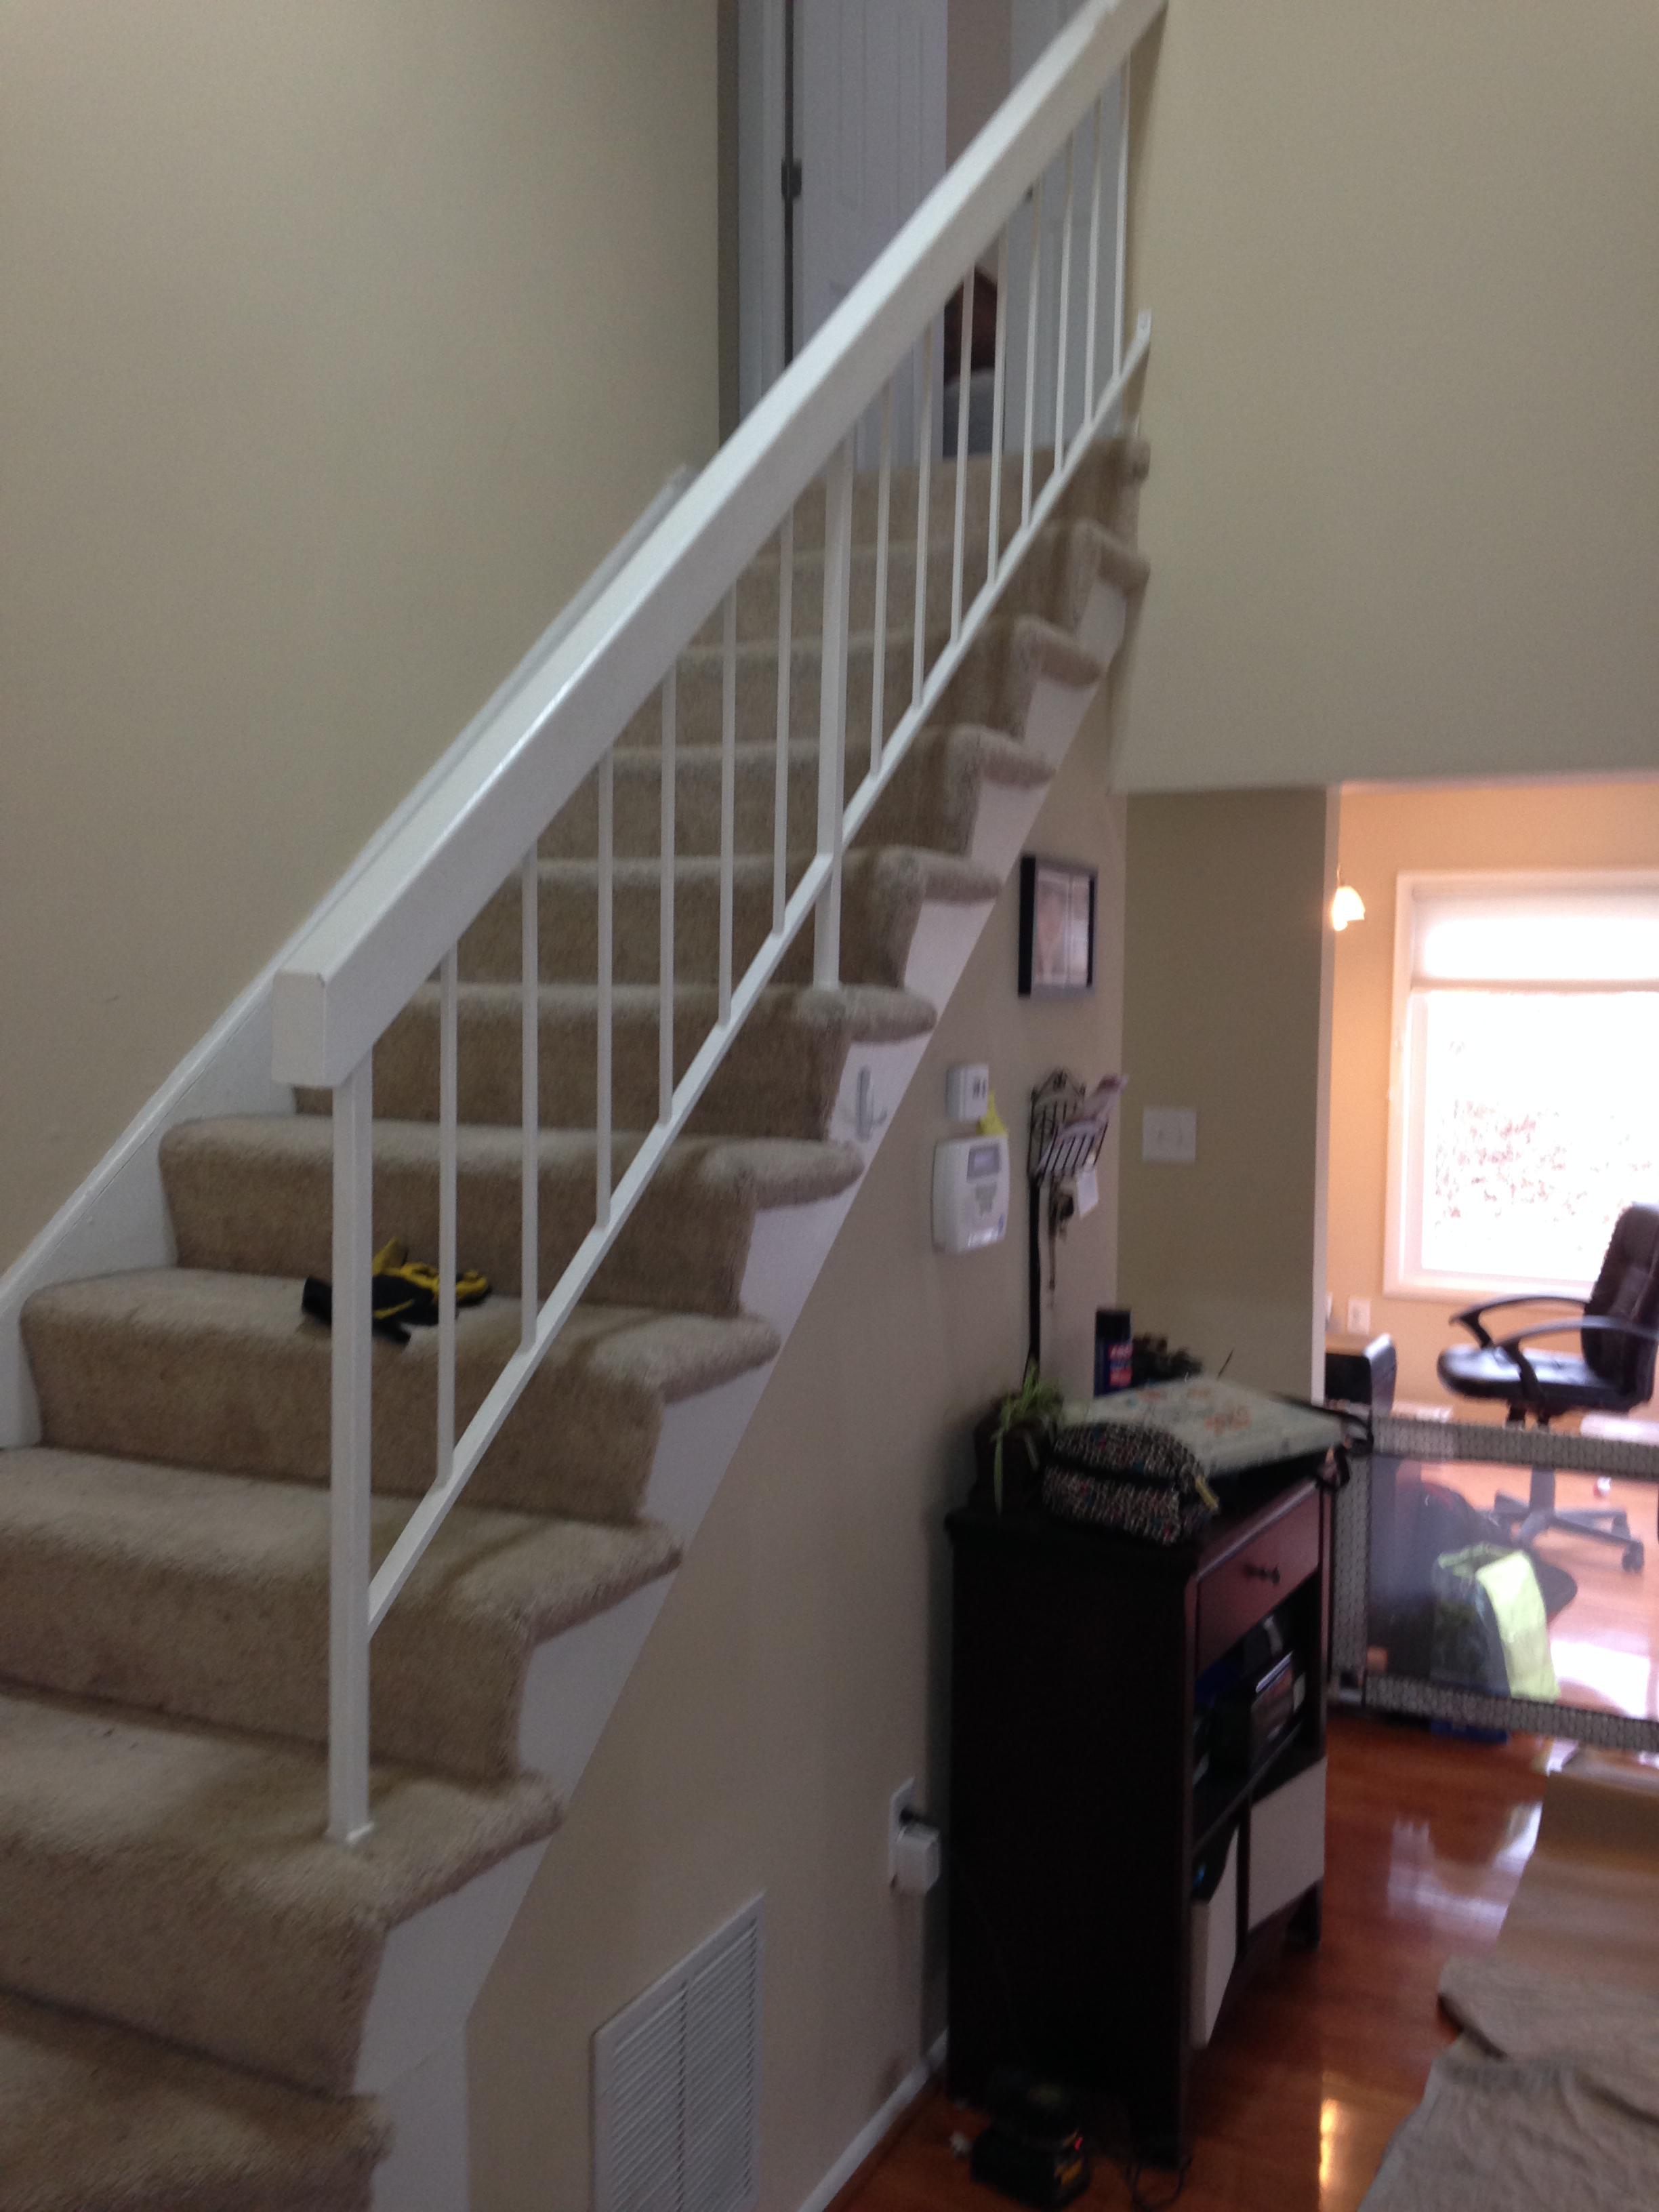 Stairway railing before renovation